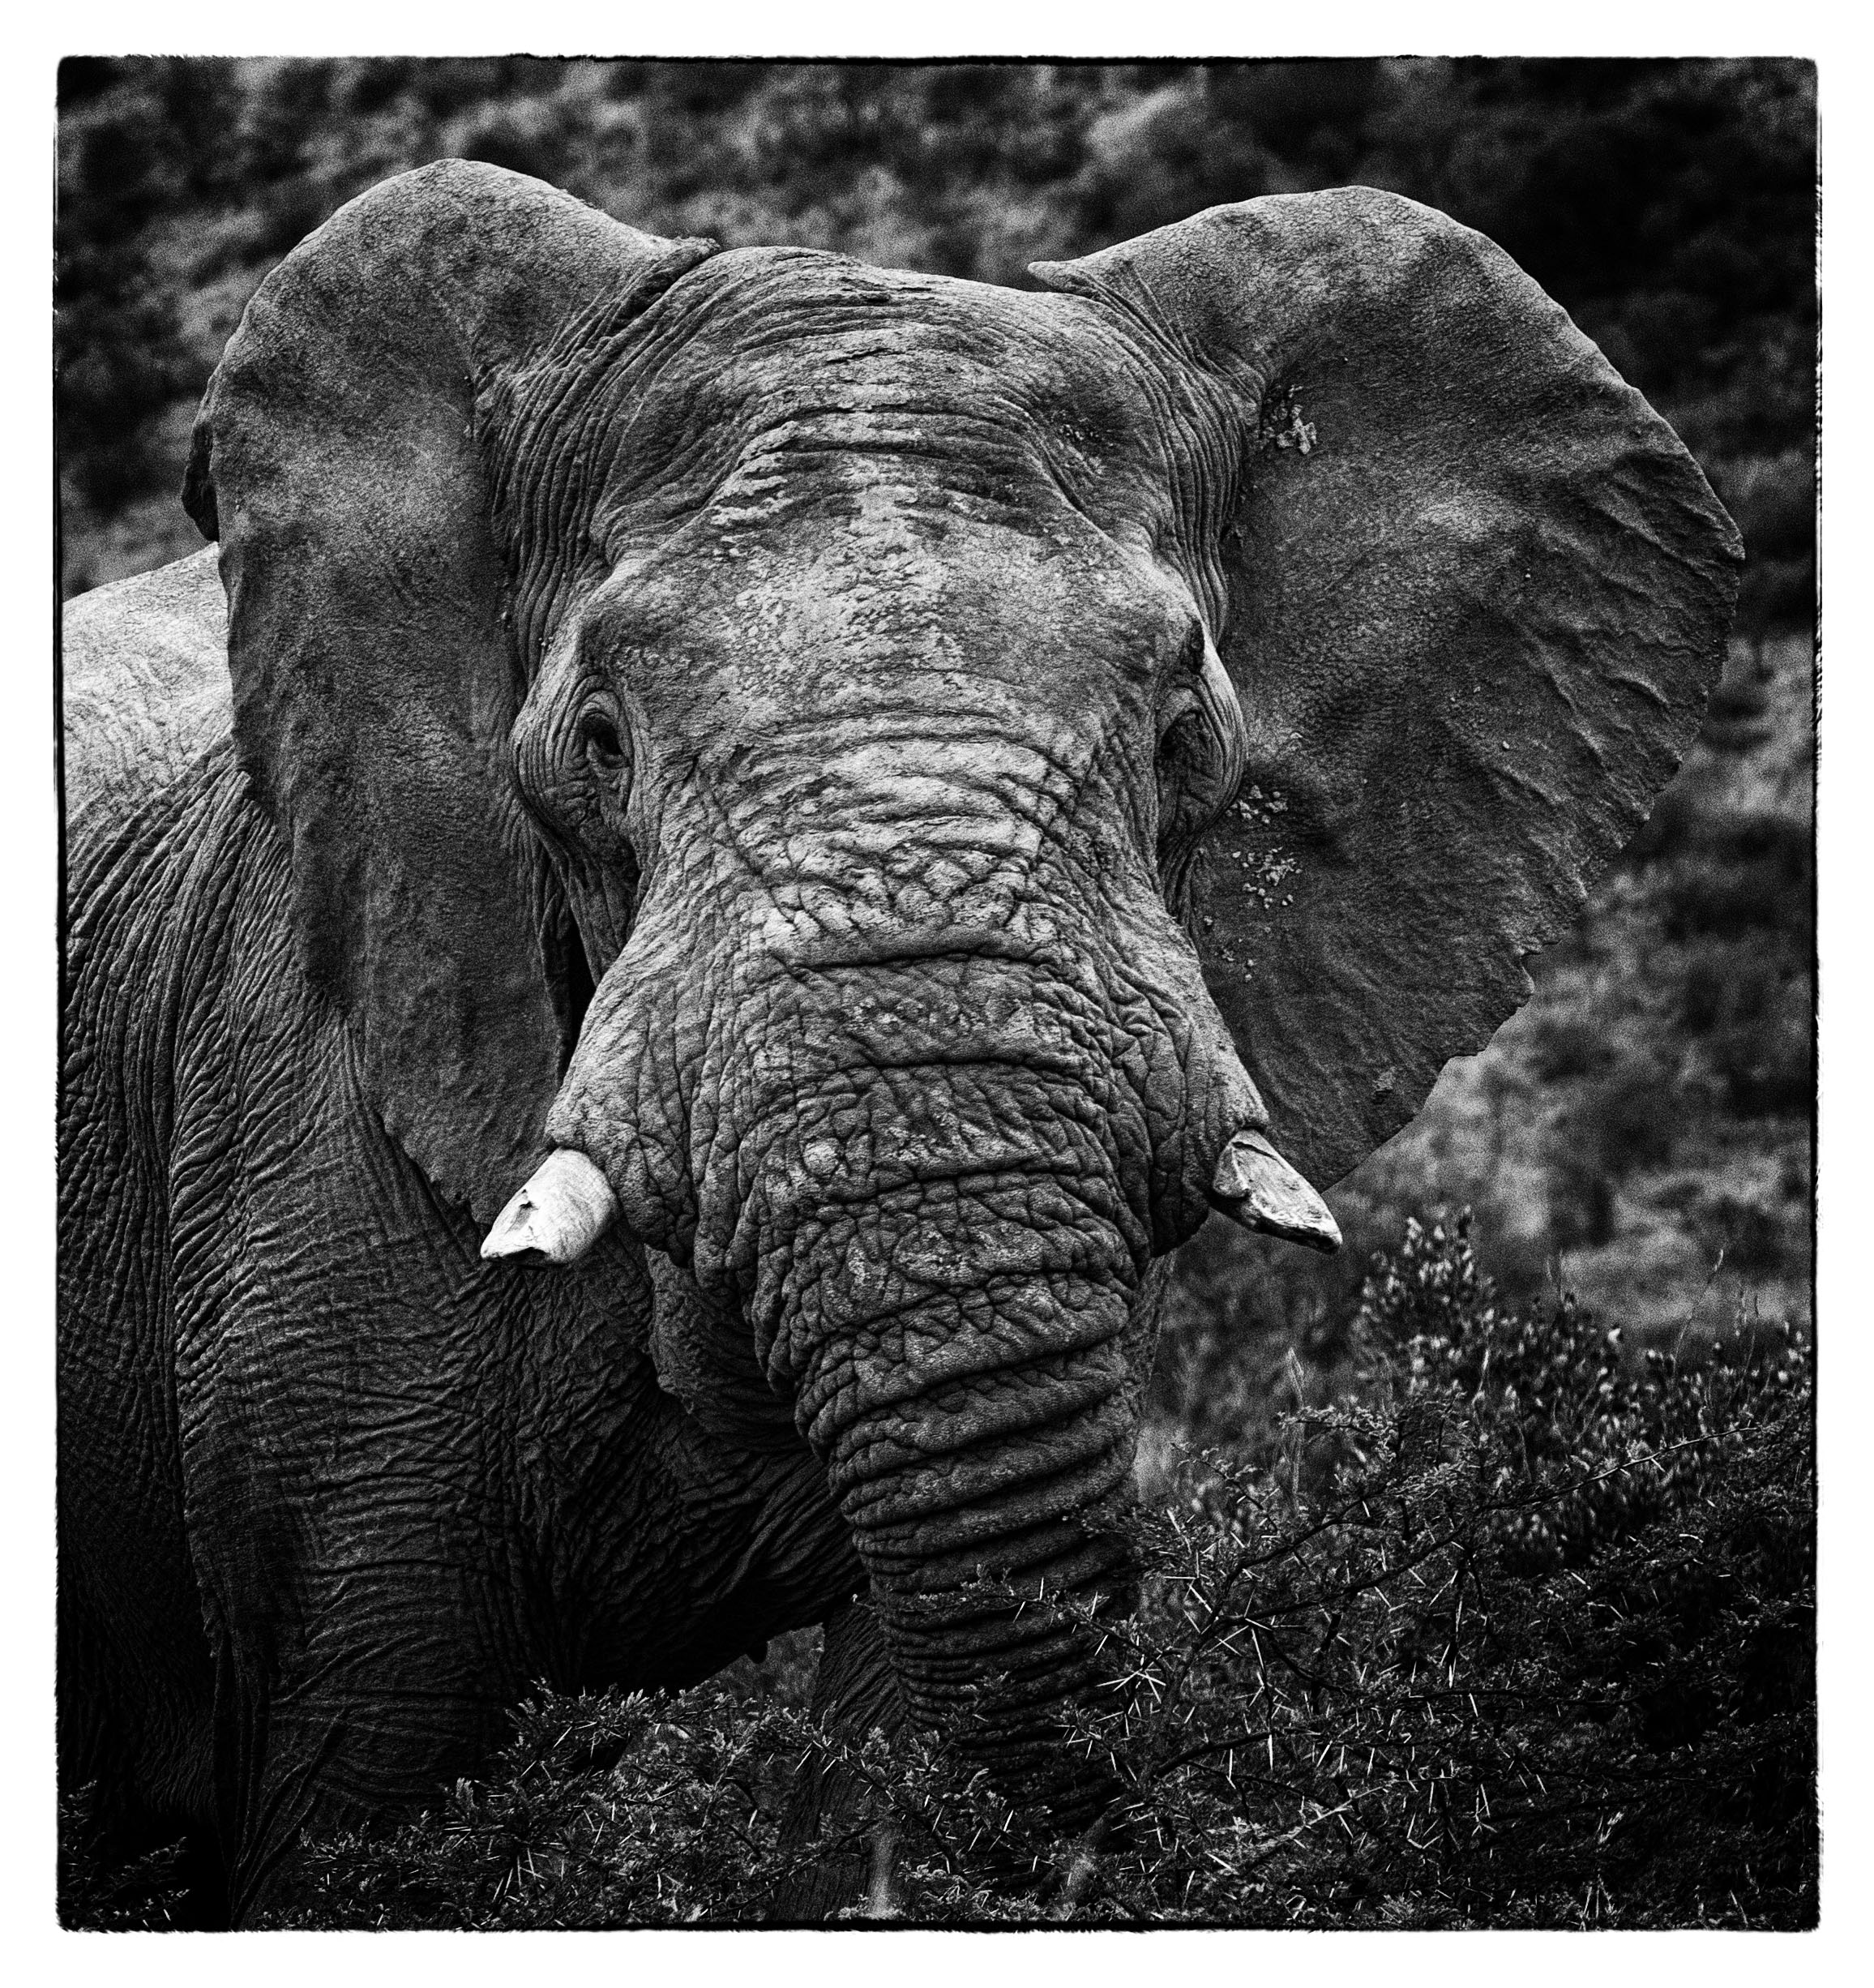 Elephant Face BW.jpg